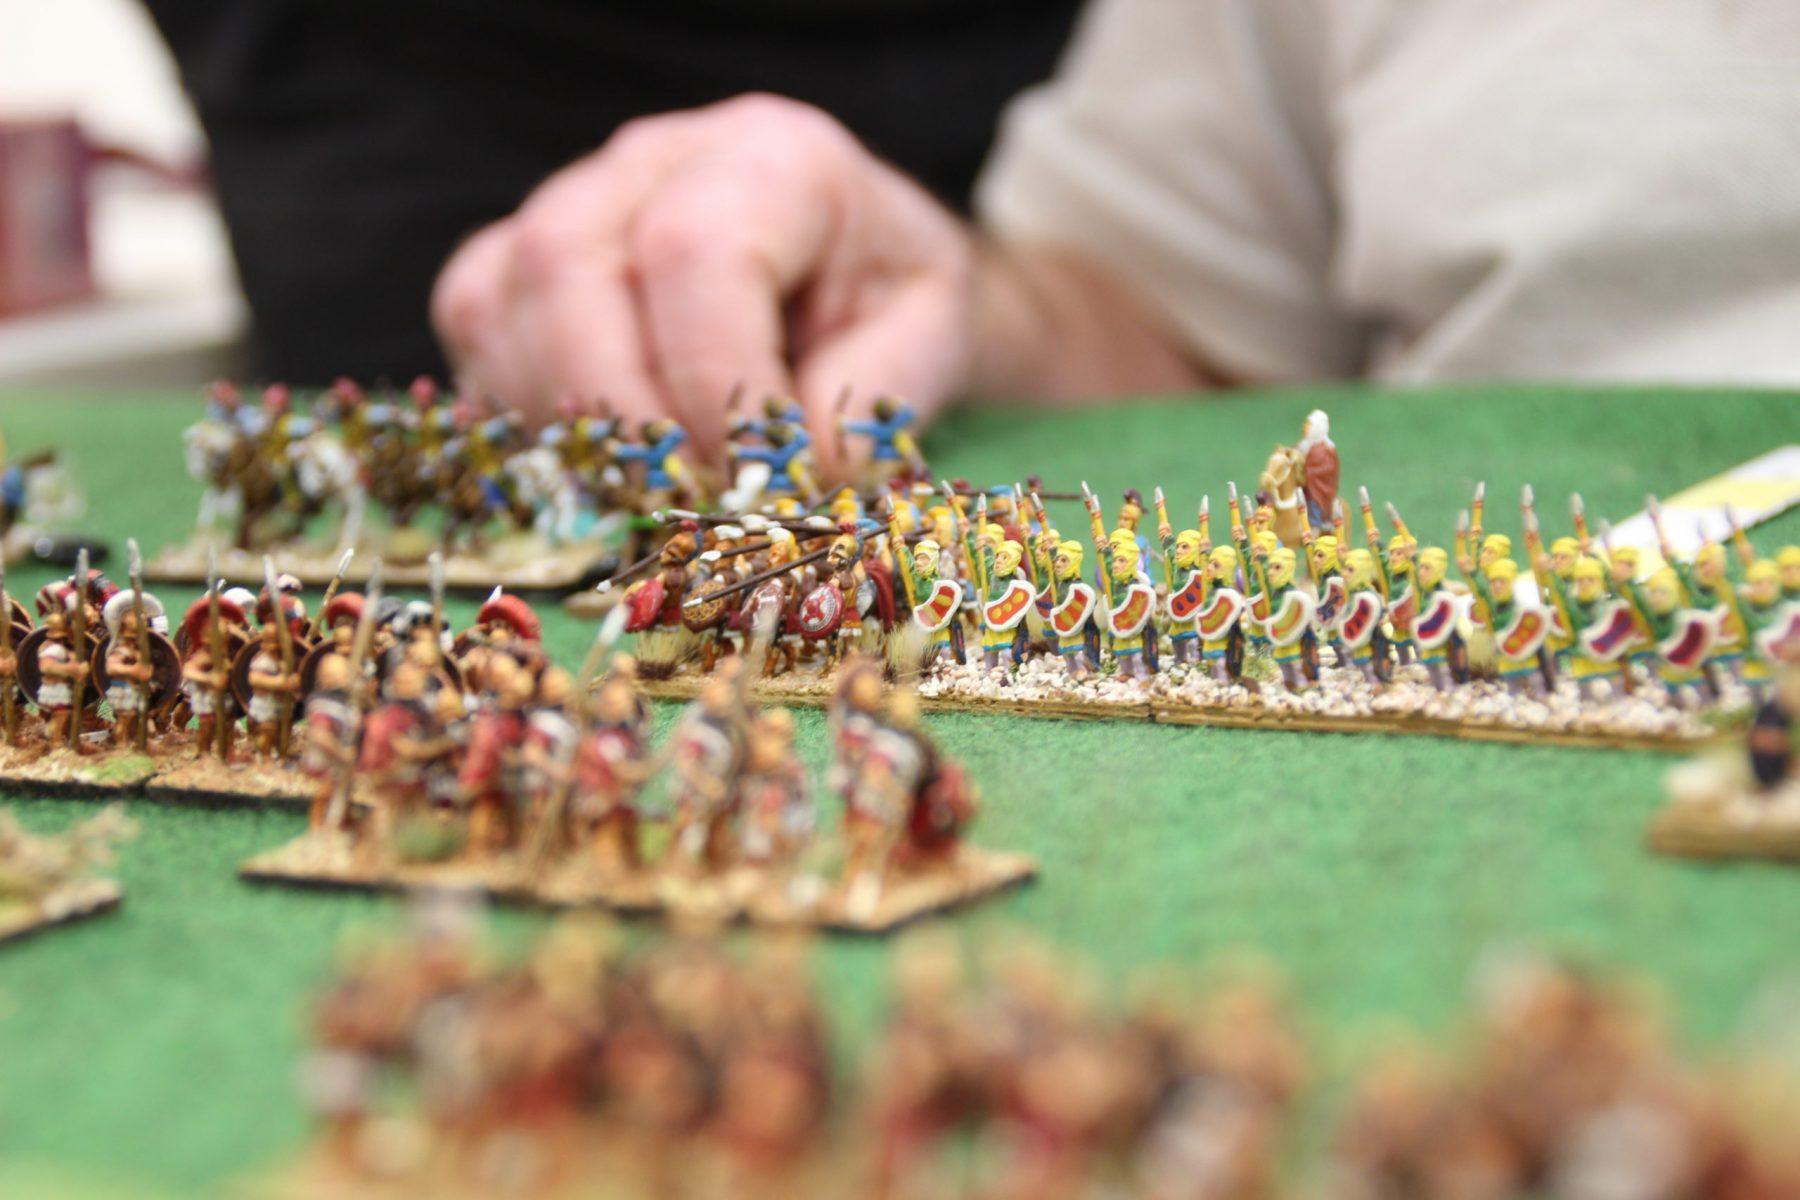 L'infanterie lourde des perses rentrant en contact avec les hoplites grecs classiques.